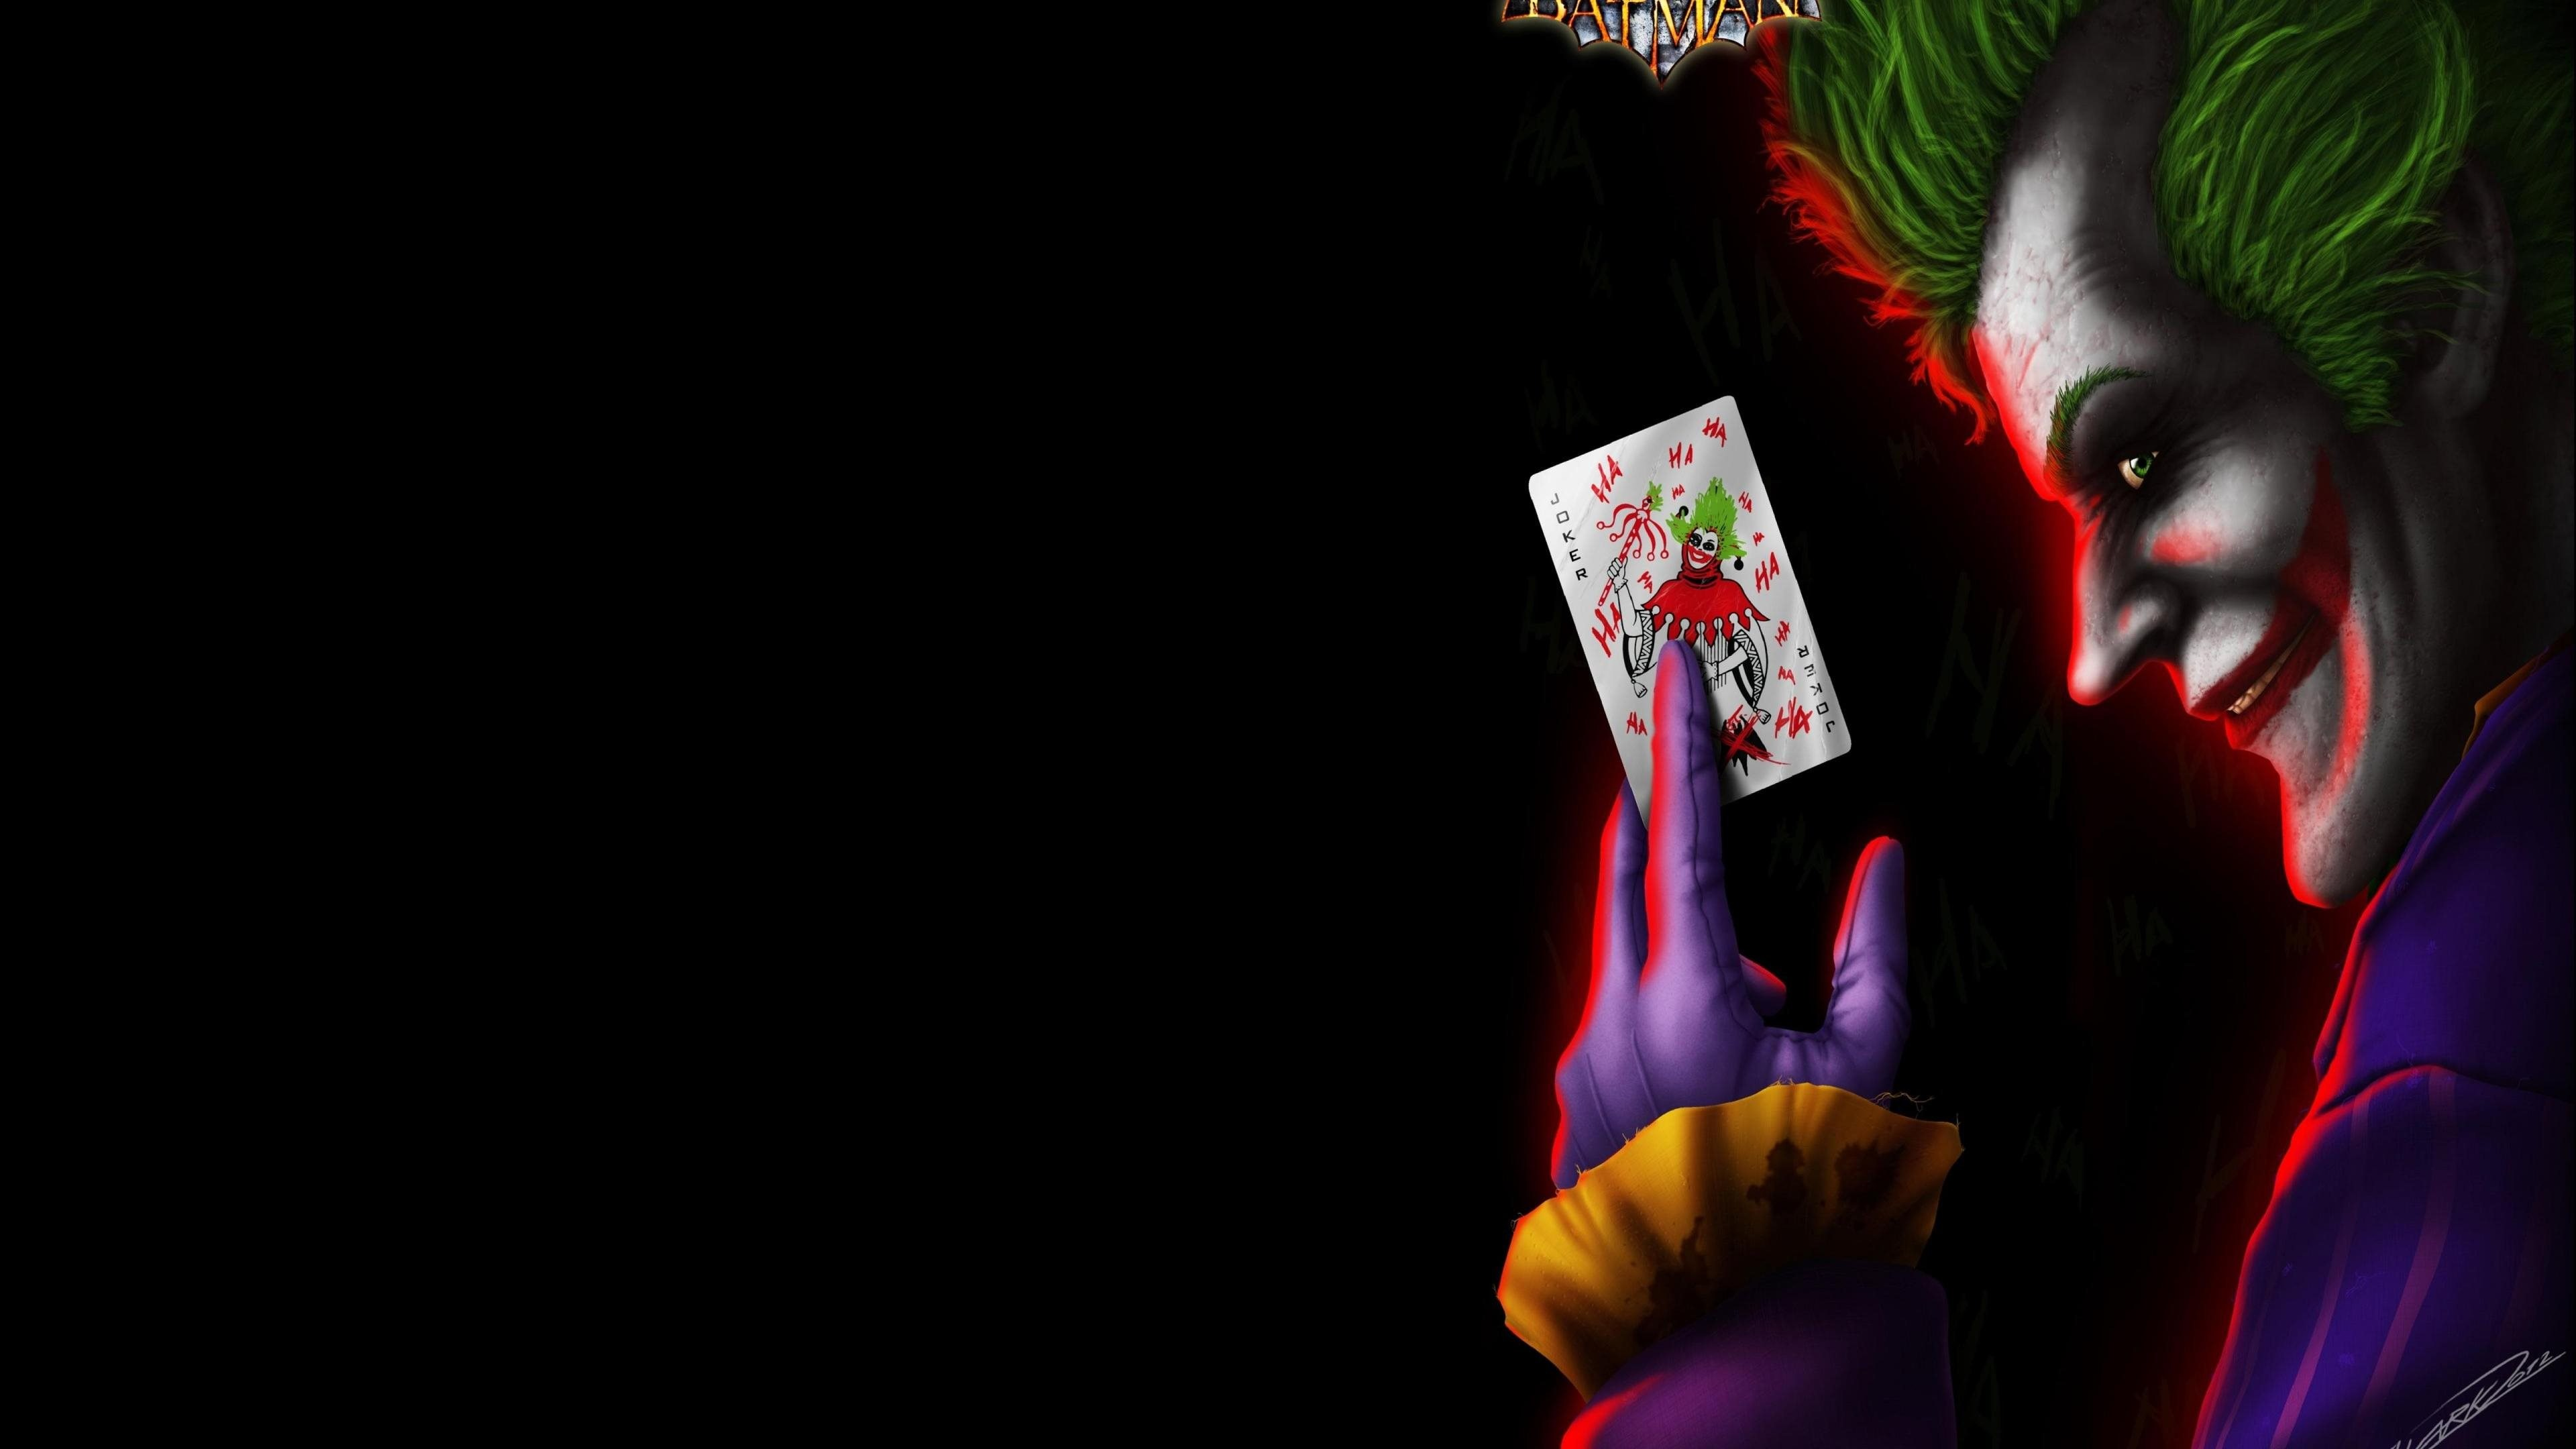 Sfondi joker 83 immagini for Immagini joker hd